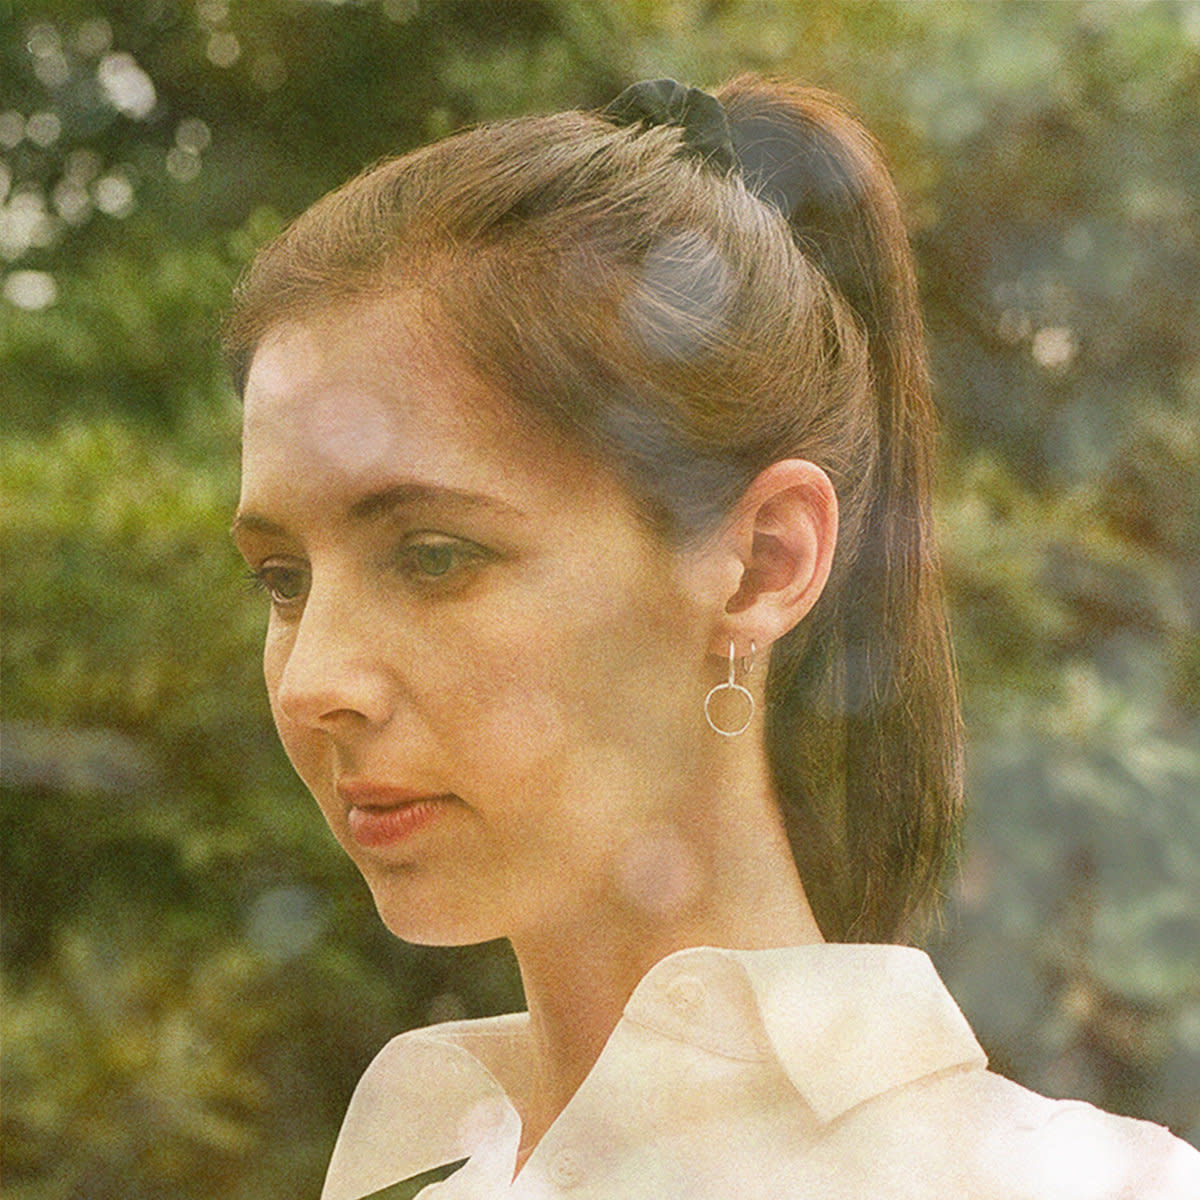 Kallista Carla Dal Forno - Look Up Sharp